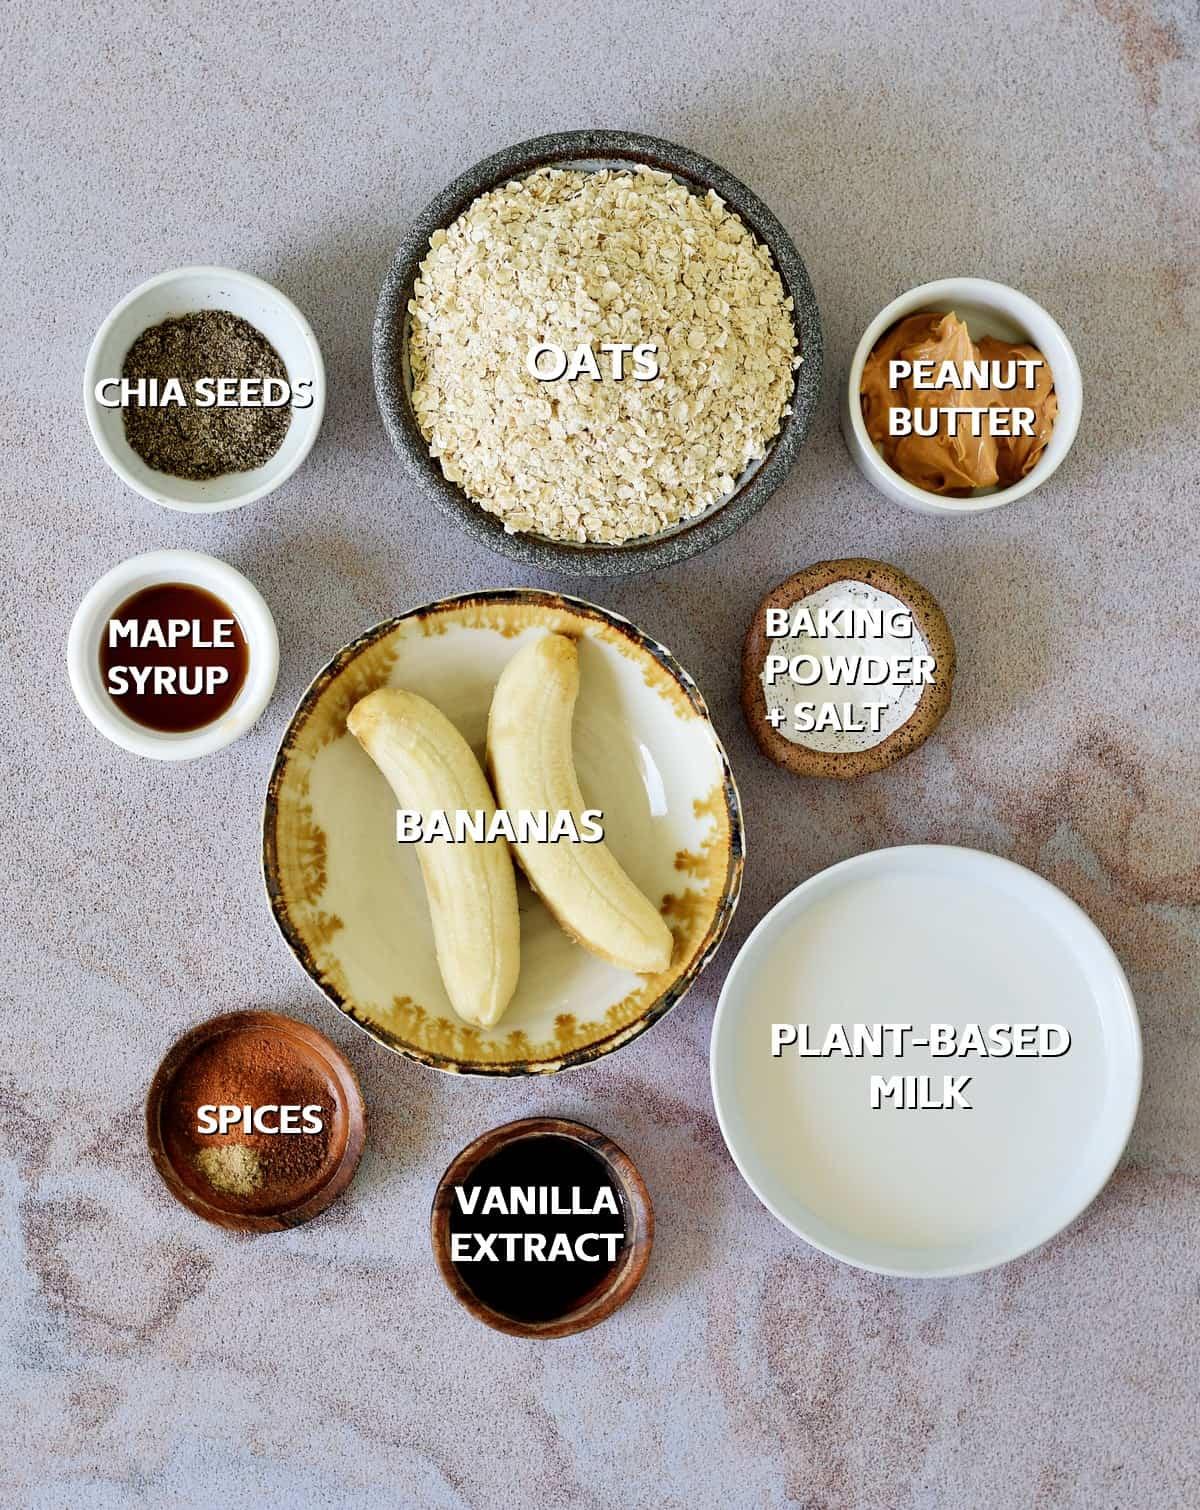 ingredients for oat bake